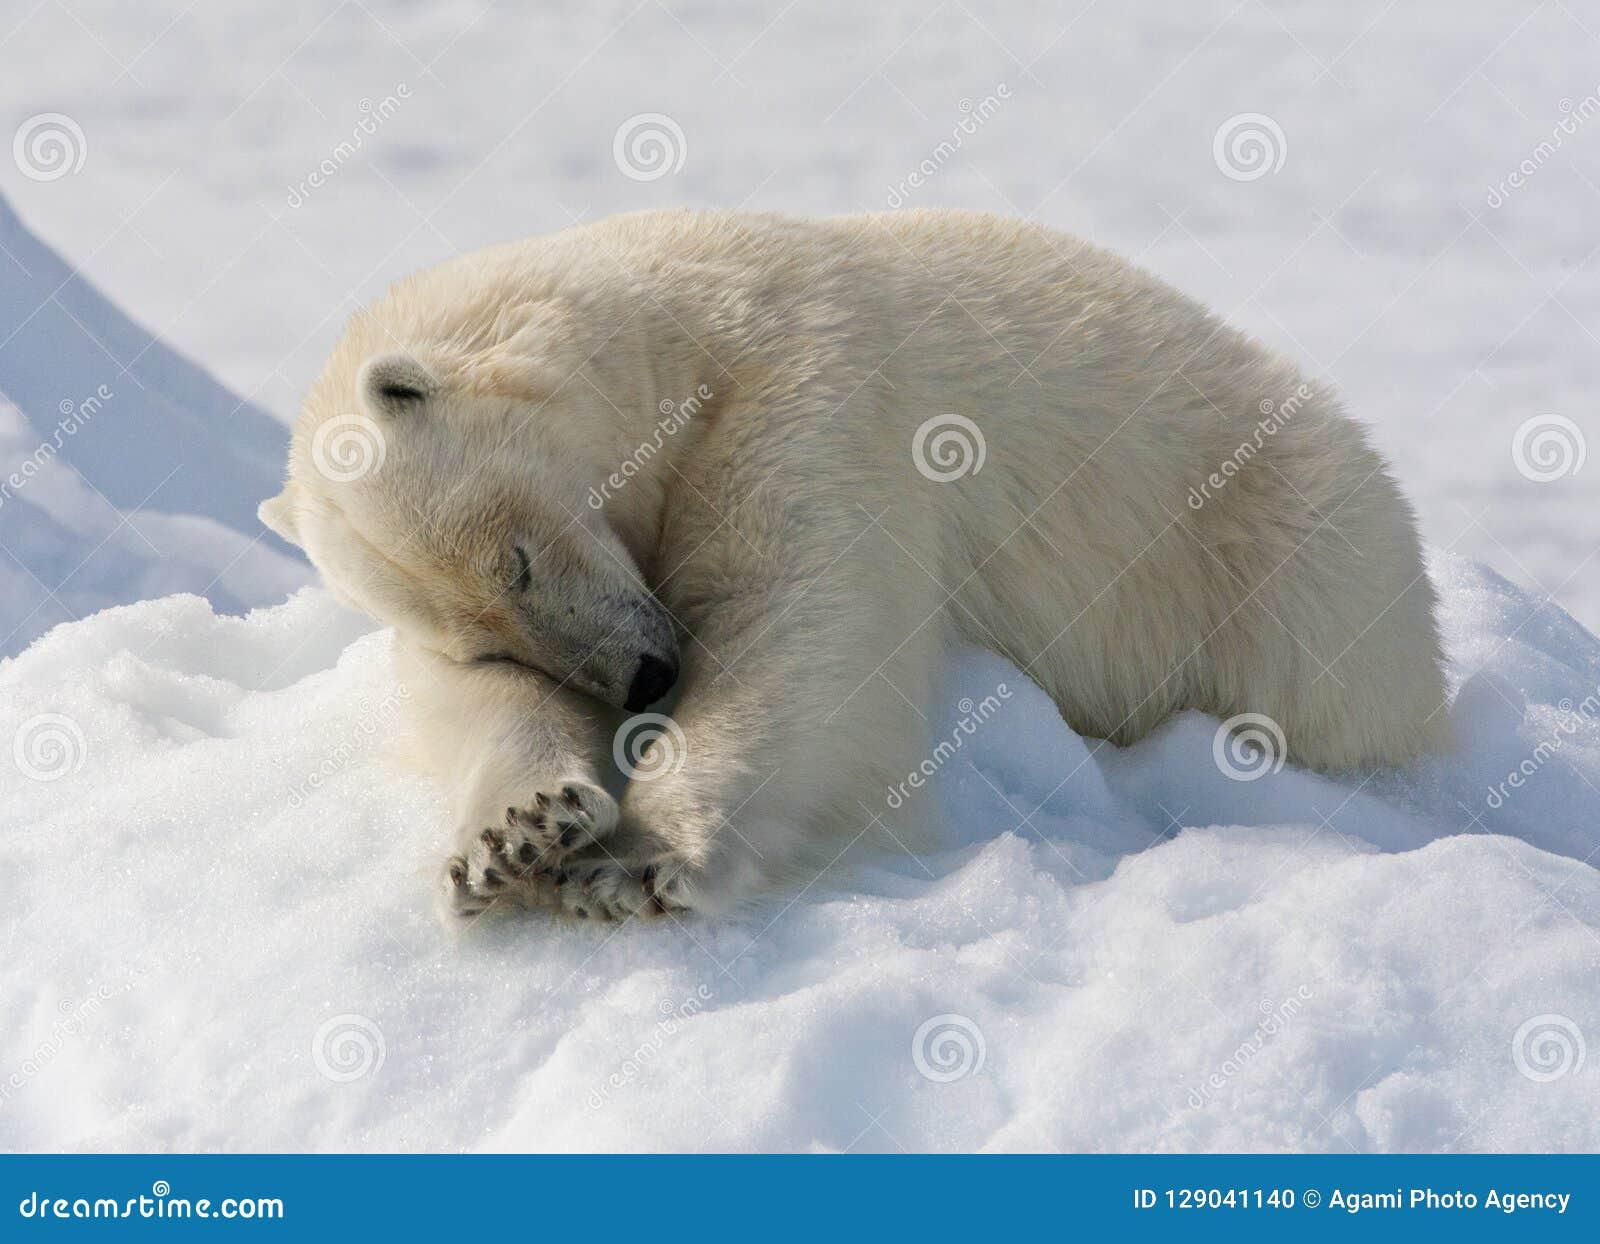 IJsbeer Spitsbergen; Isbjörn Svalbard